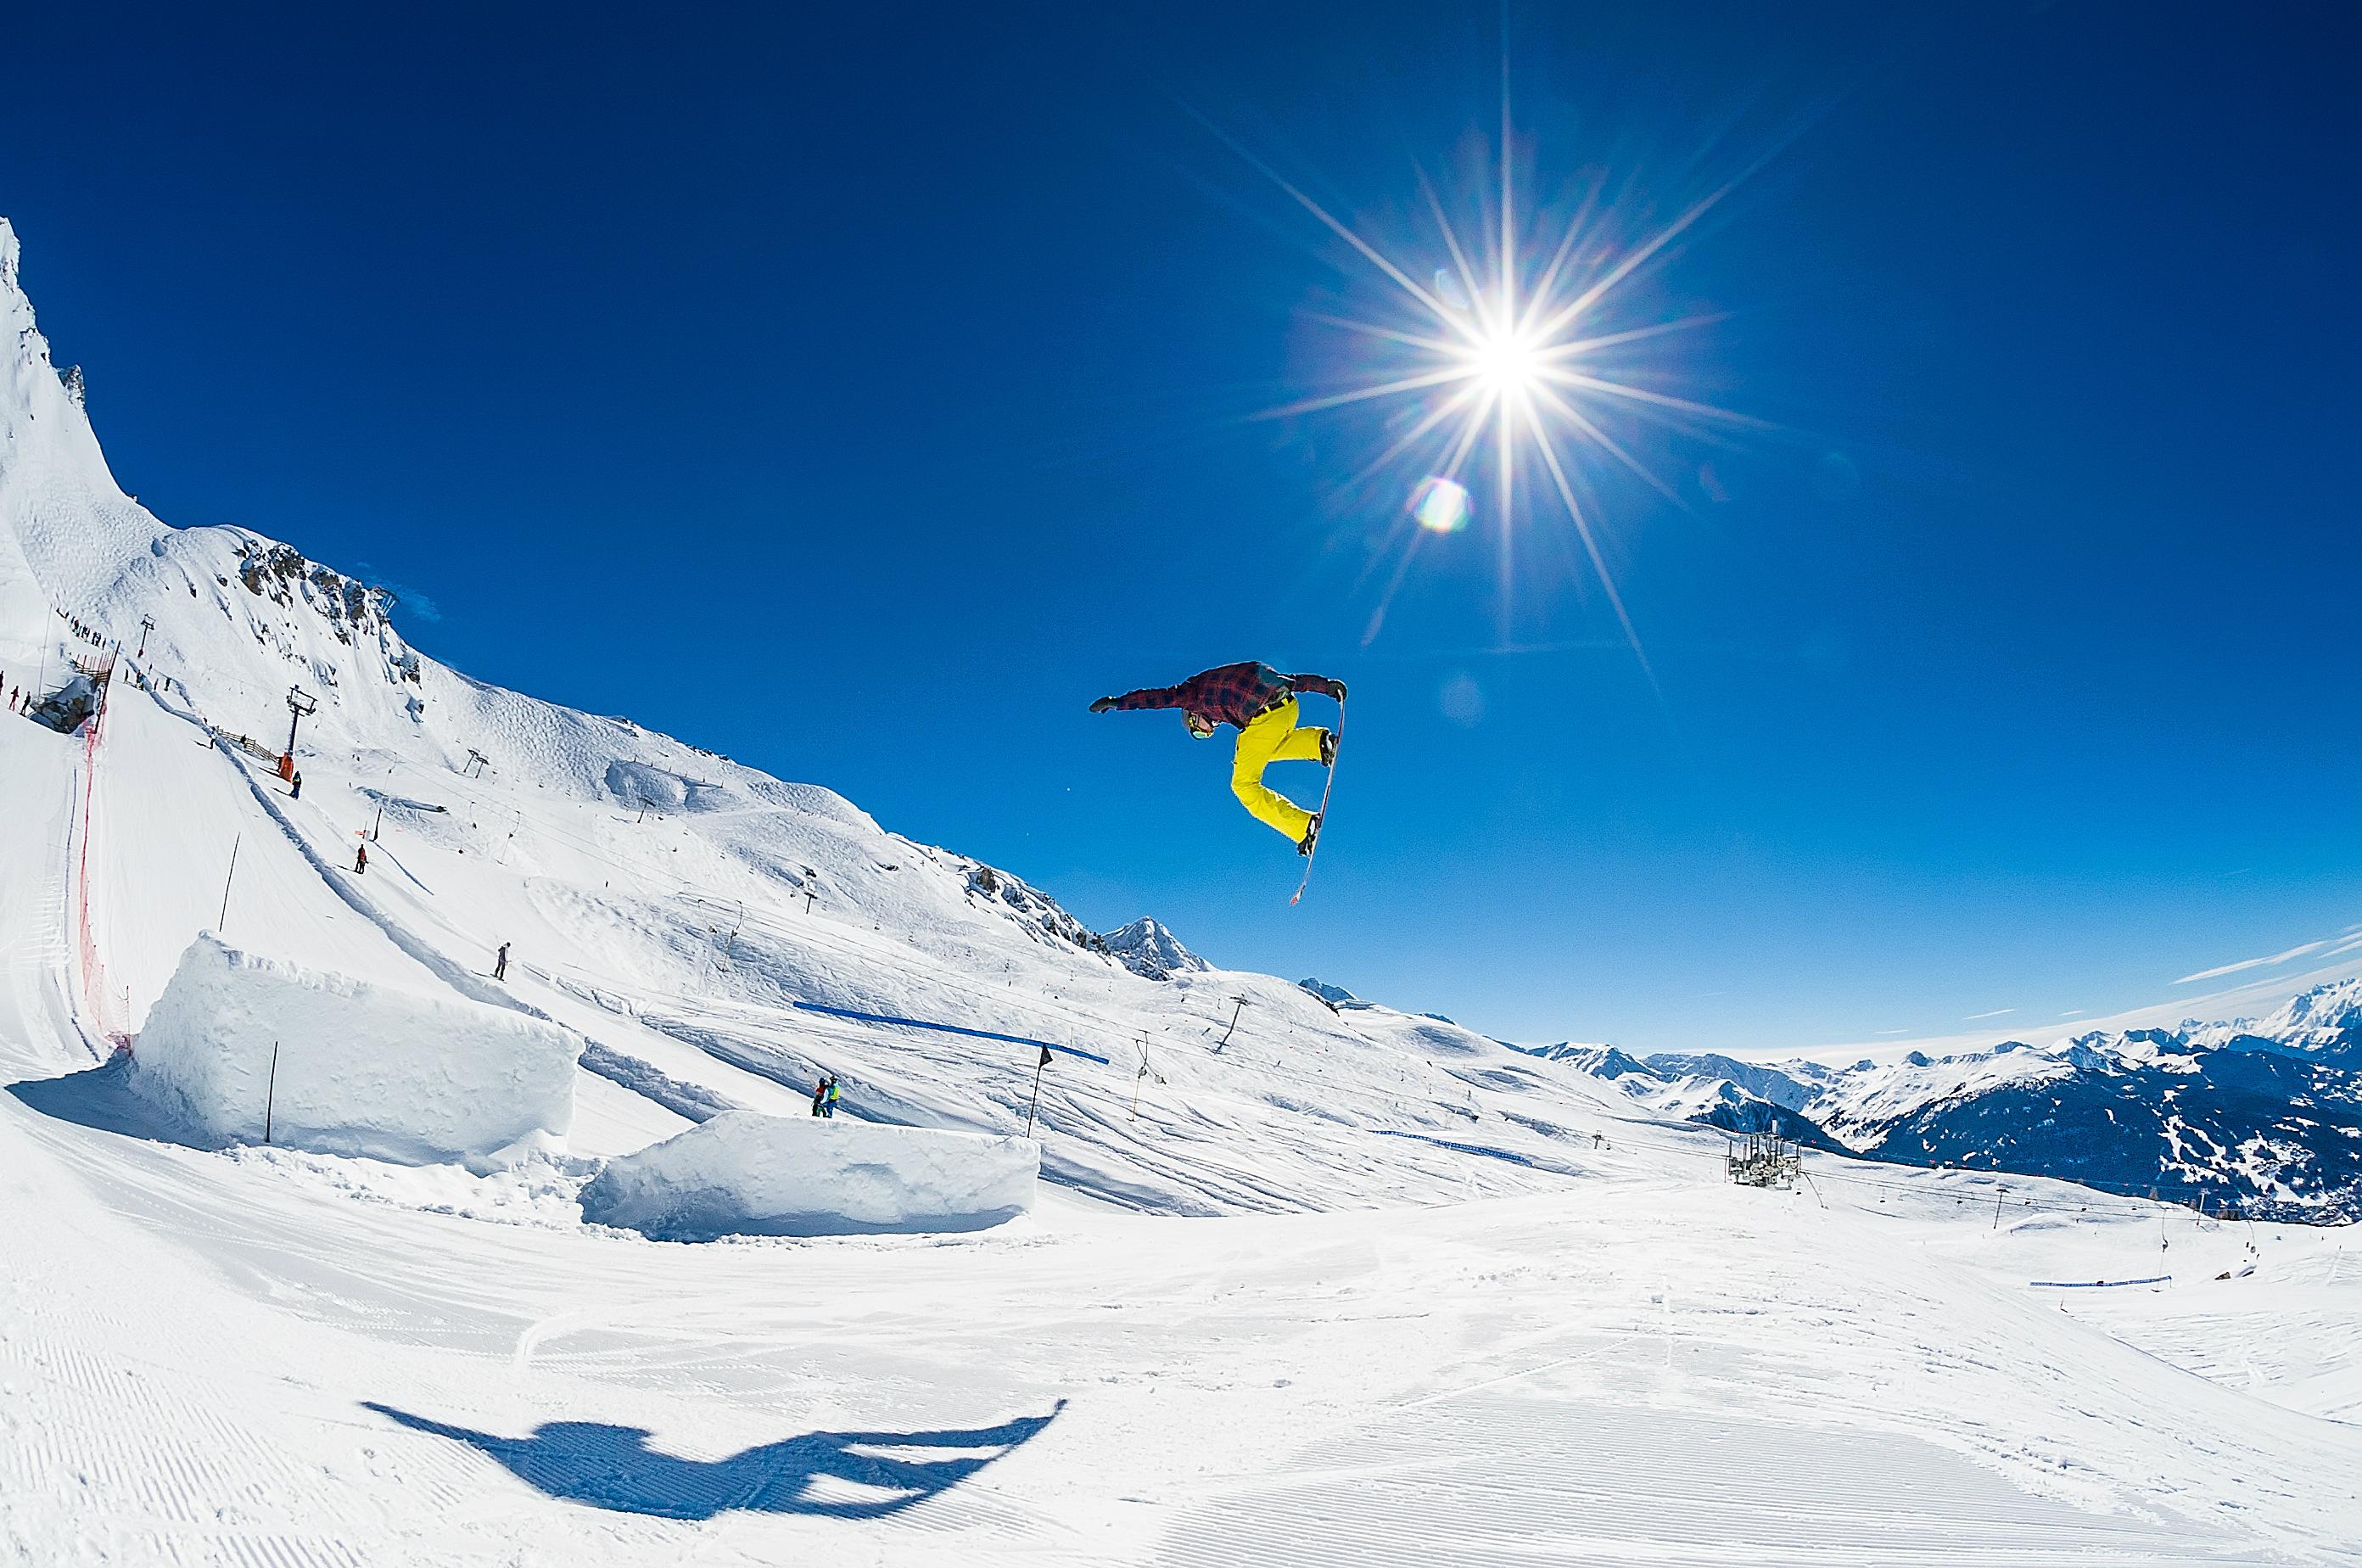 Station de ski, Les Arcs